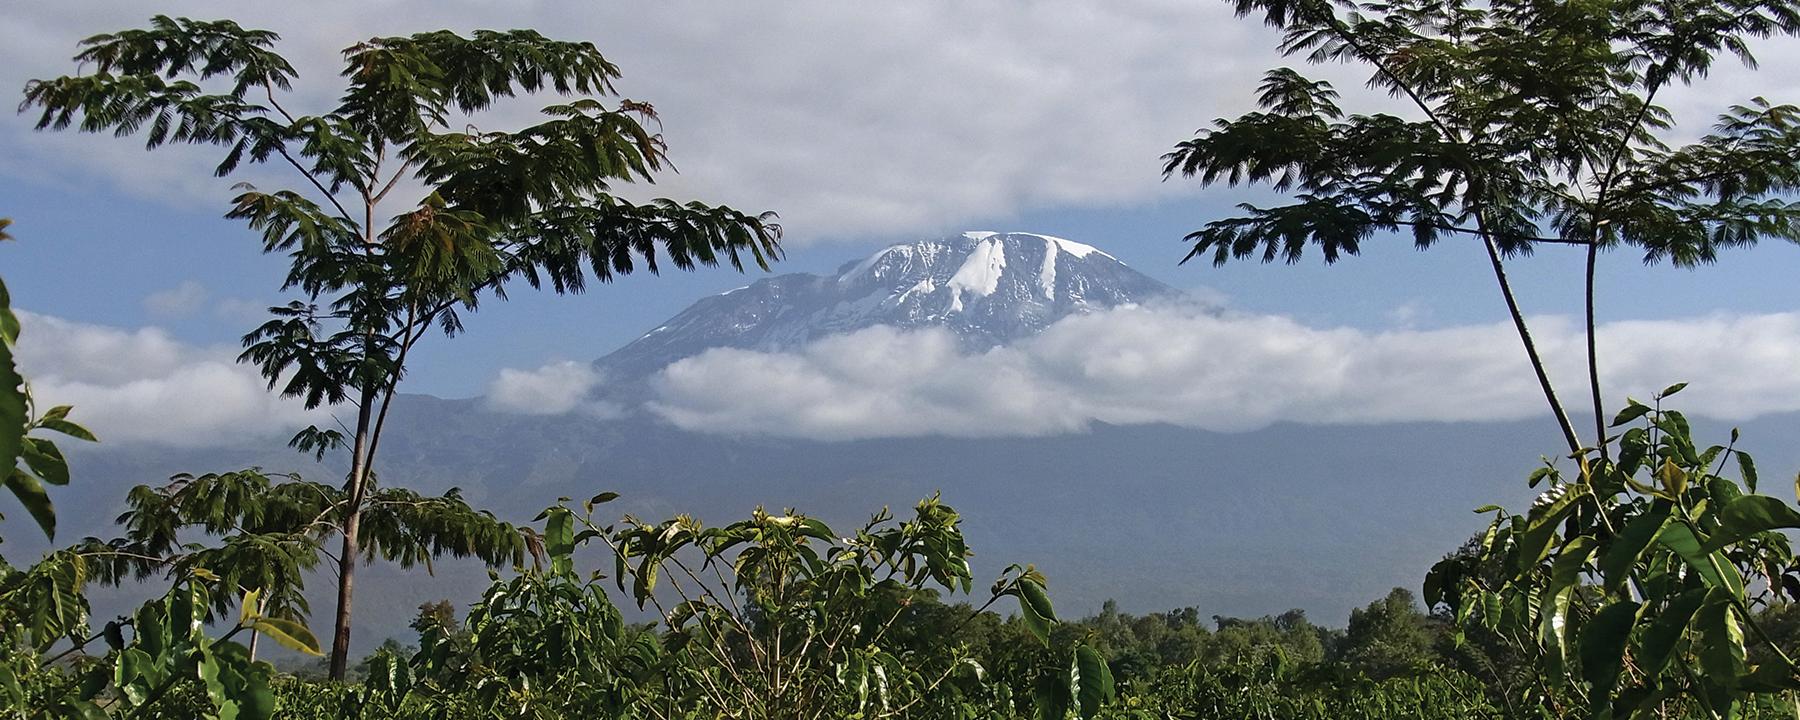 Agriculture and Climate Shape Biodiversity on Mount Kilimanjaro